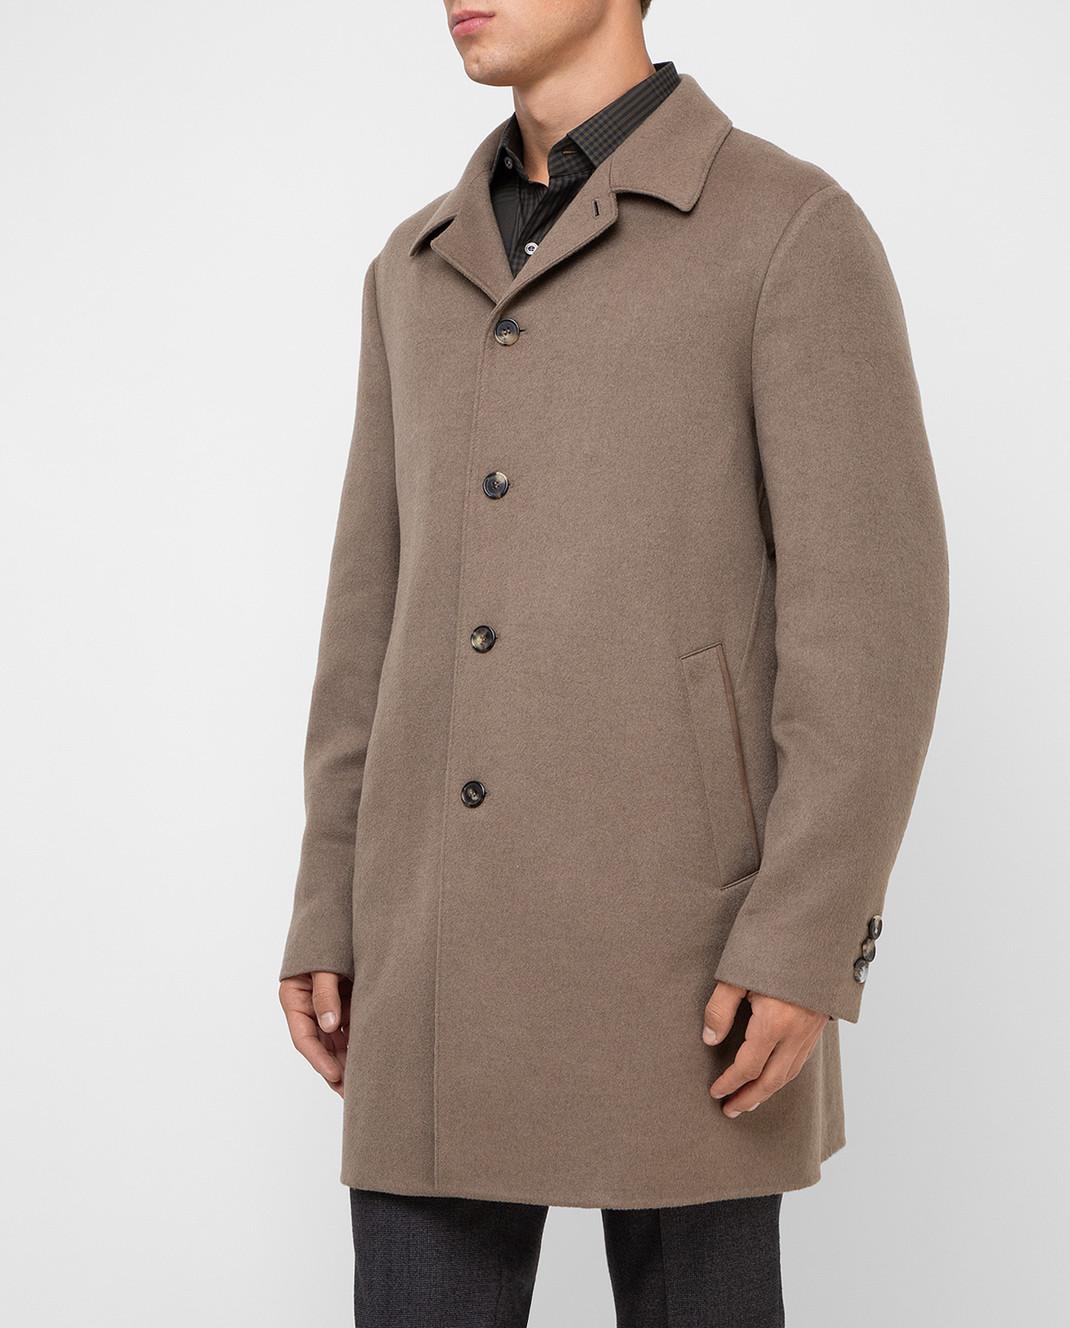 Loro Piana Темно-бежевое пальто из кашемира F1FAI2410 изображение 3